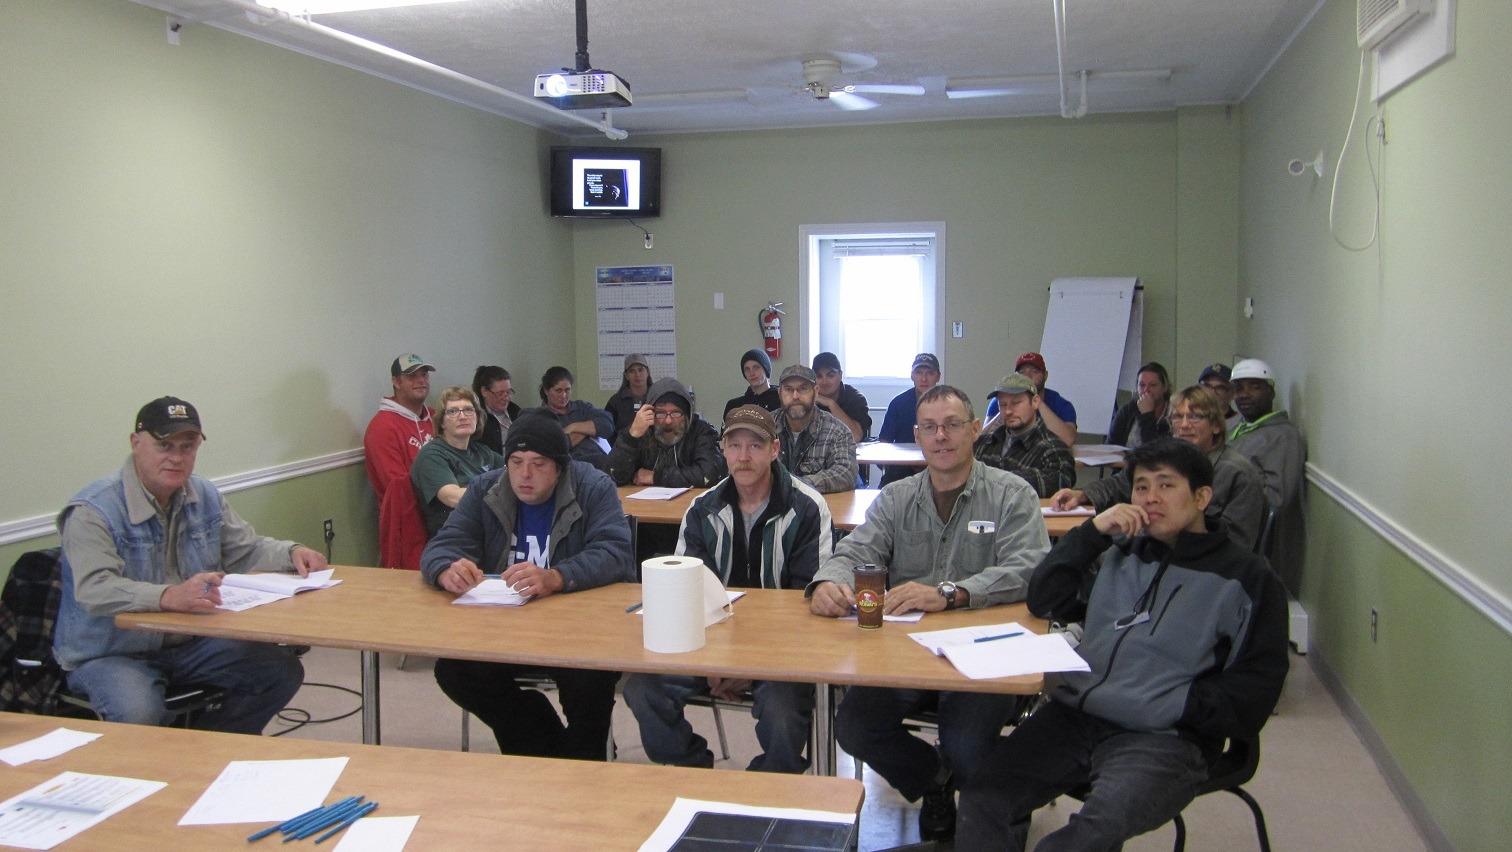 Halifax Continuous improvement course